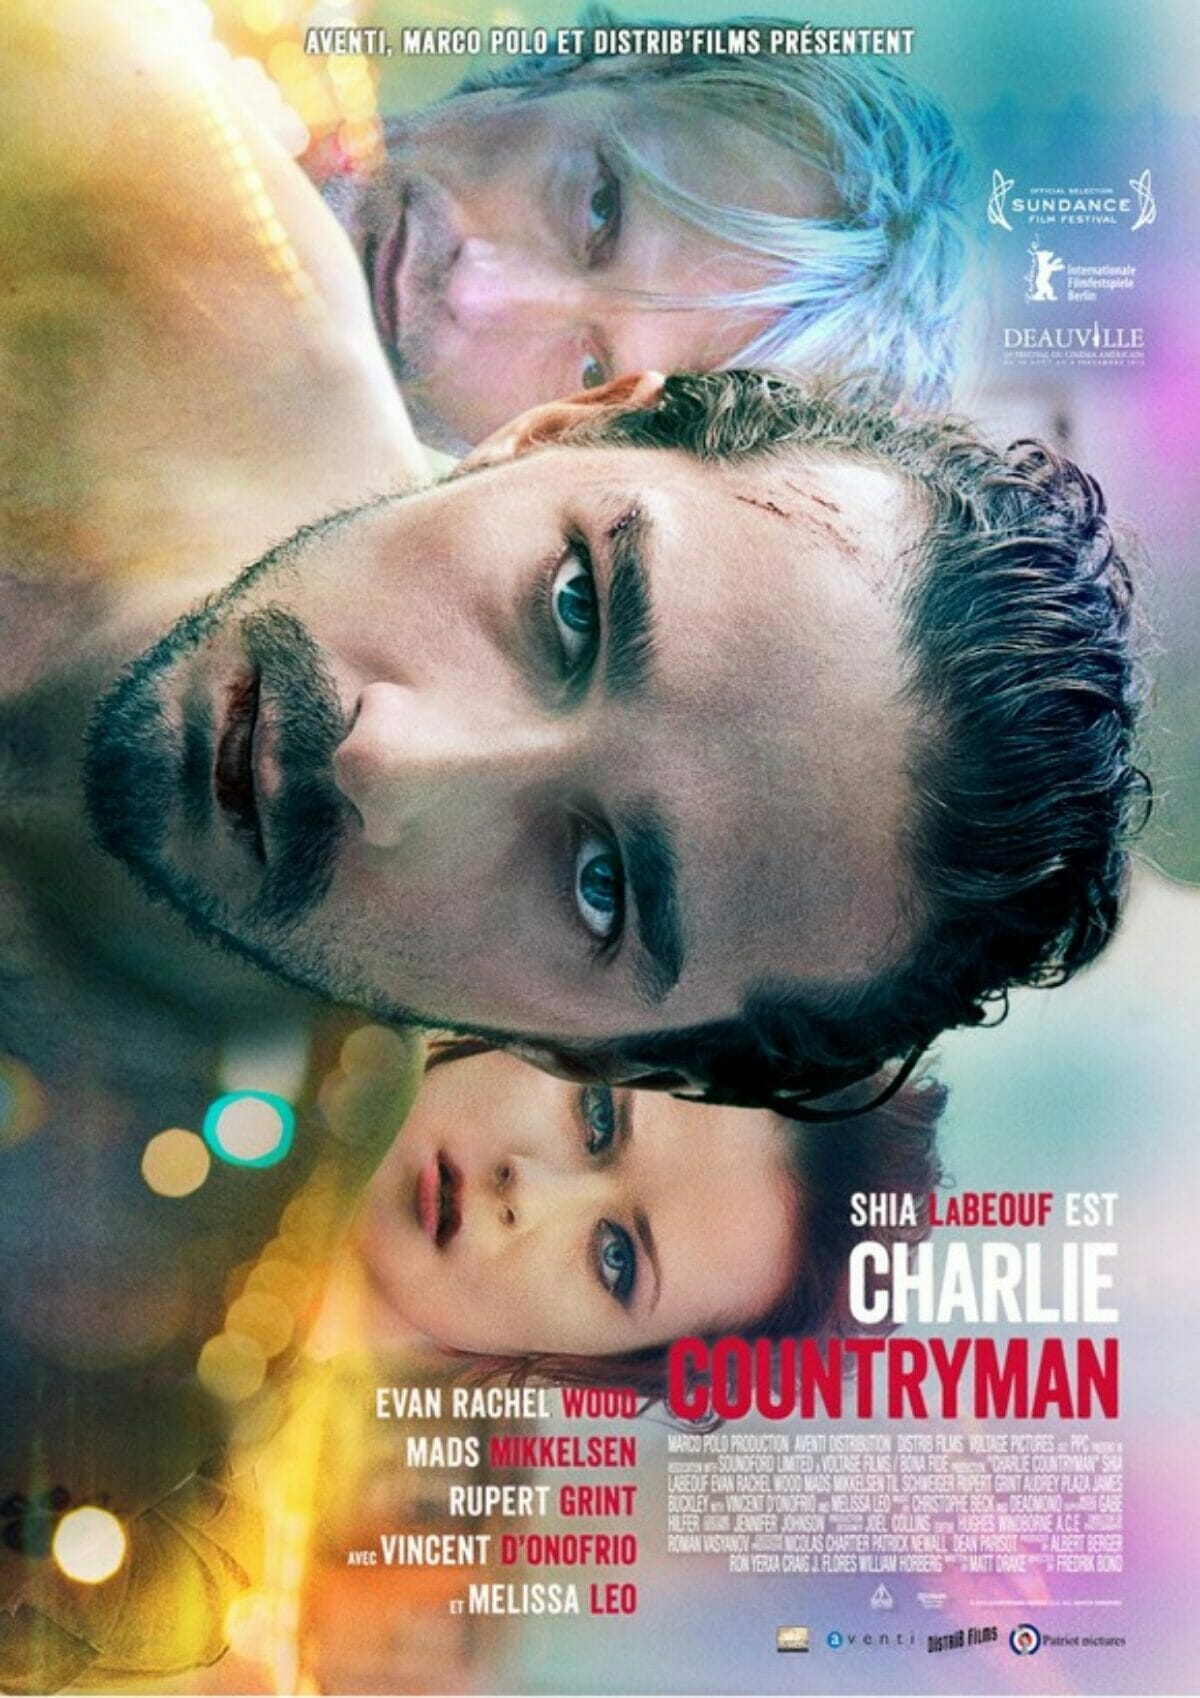 Charlie-Countryman-affiche-france